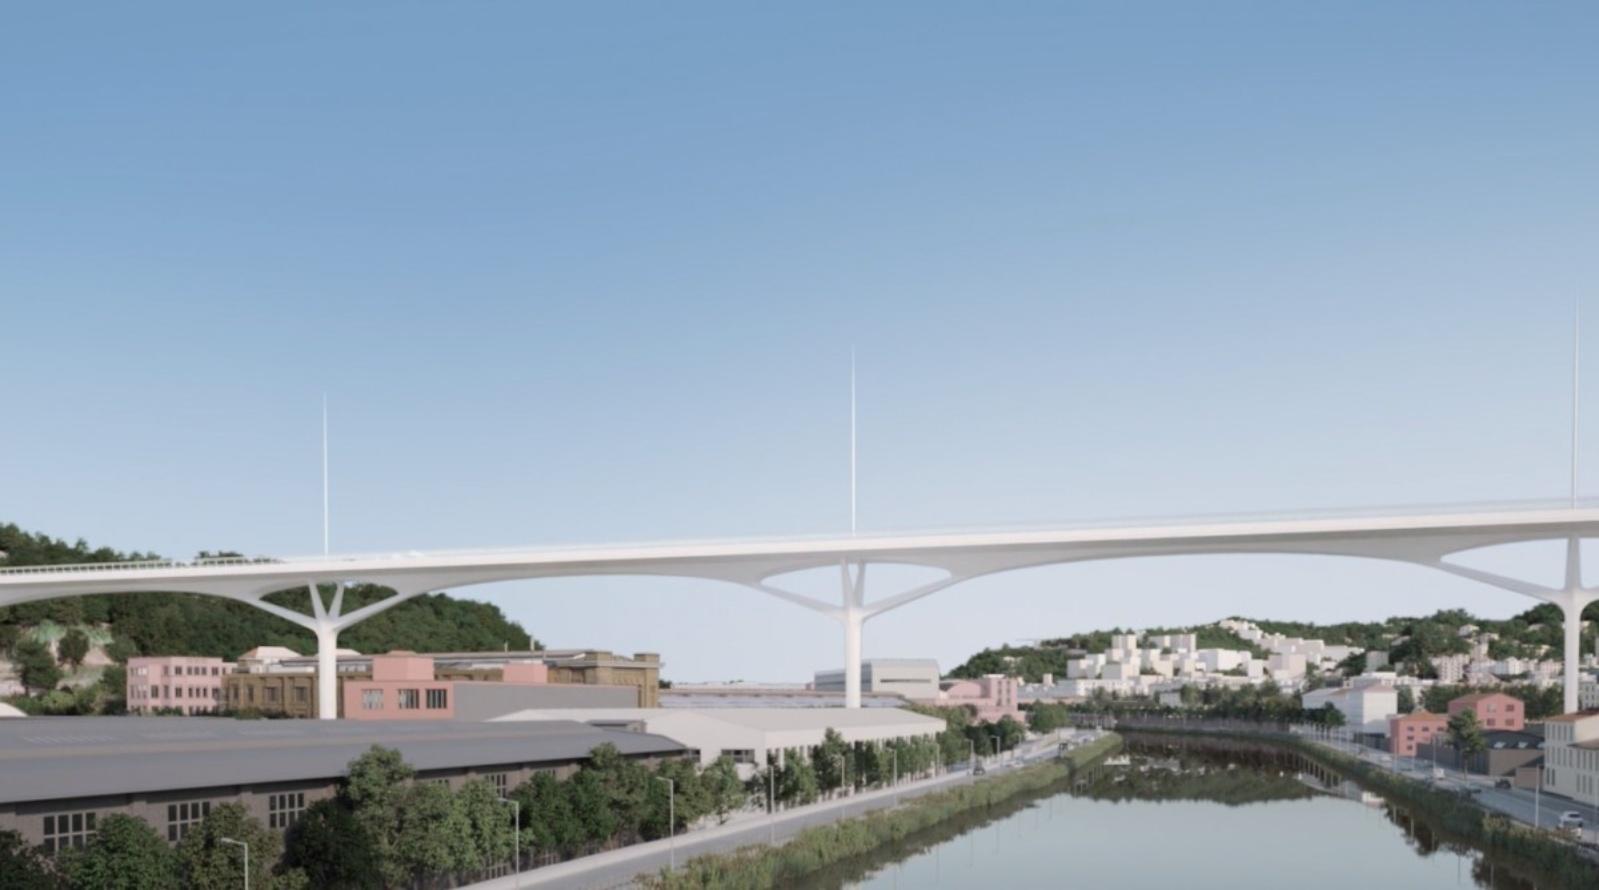 econstruction of the Morandi Bridge in Genoa